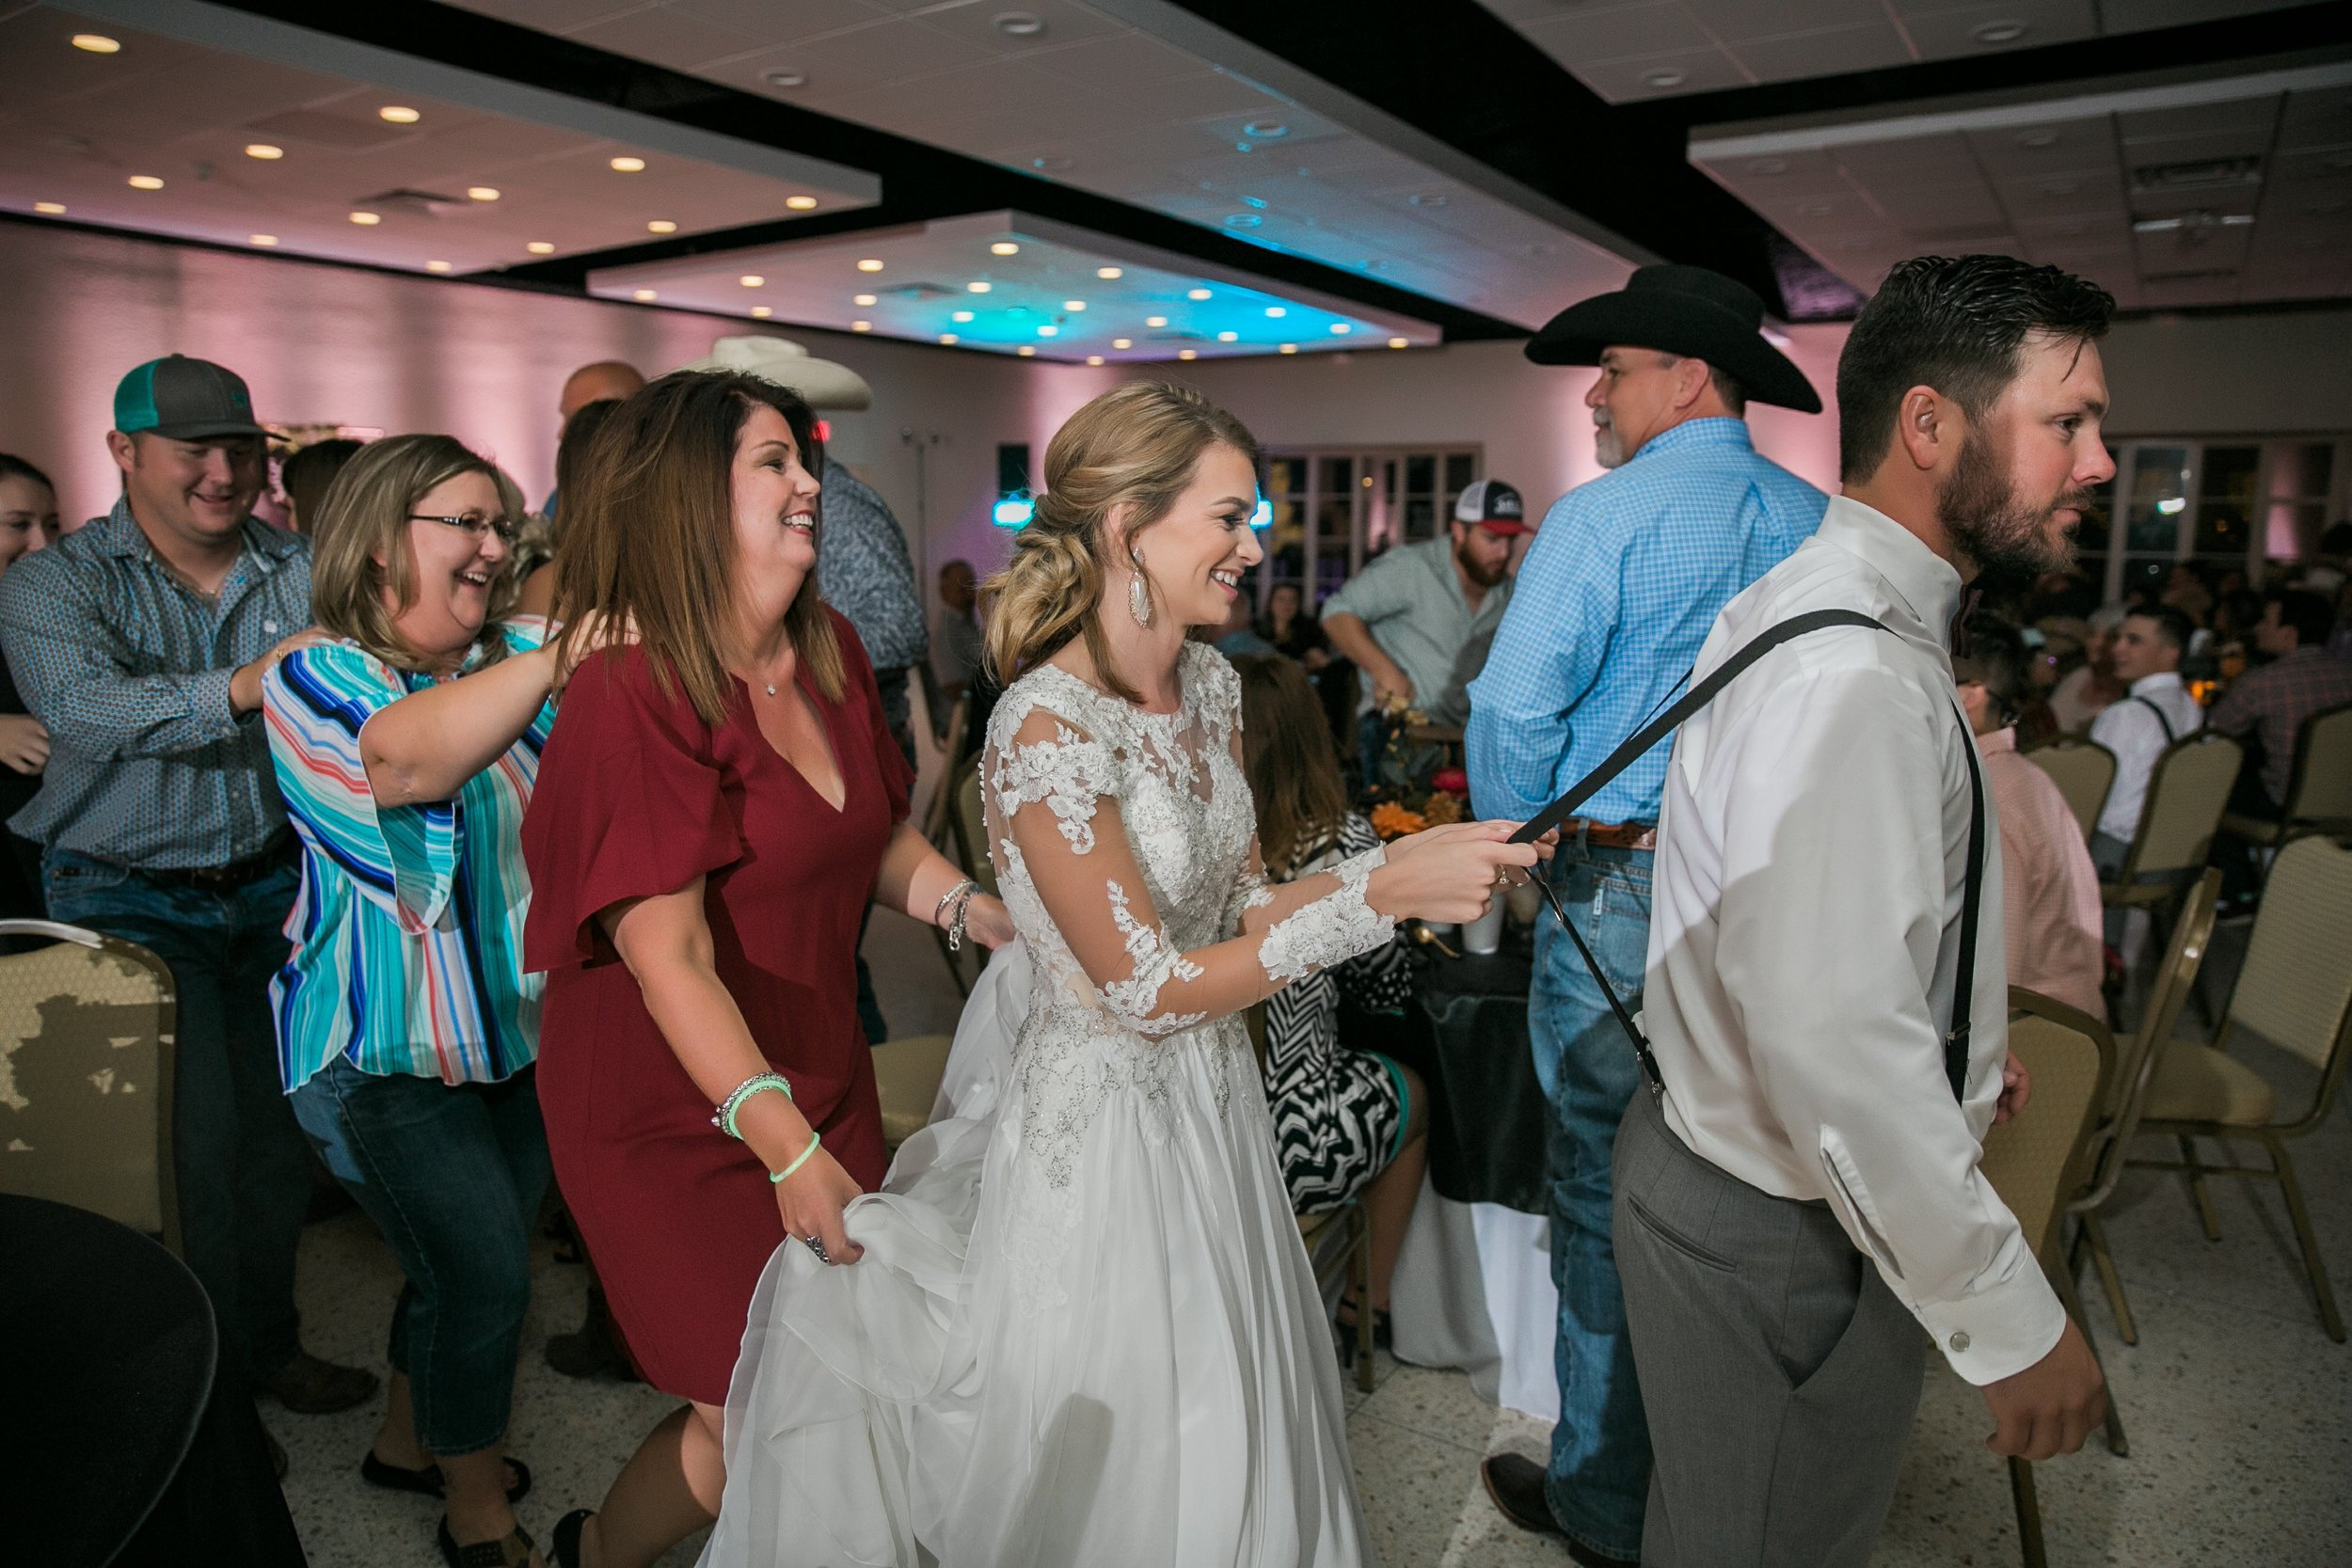 Roberson-Wedding-The-Forum-Lauren-Pinson-Wedding-Photography-Wichita-Falls-Texas-085.jpg